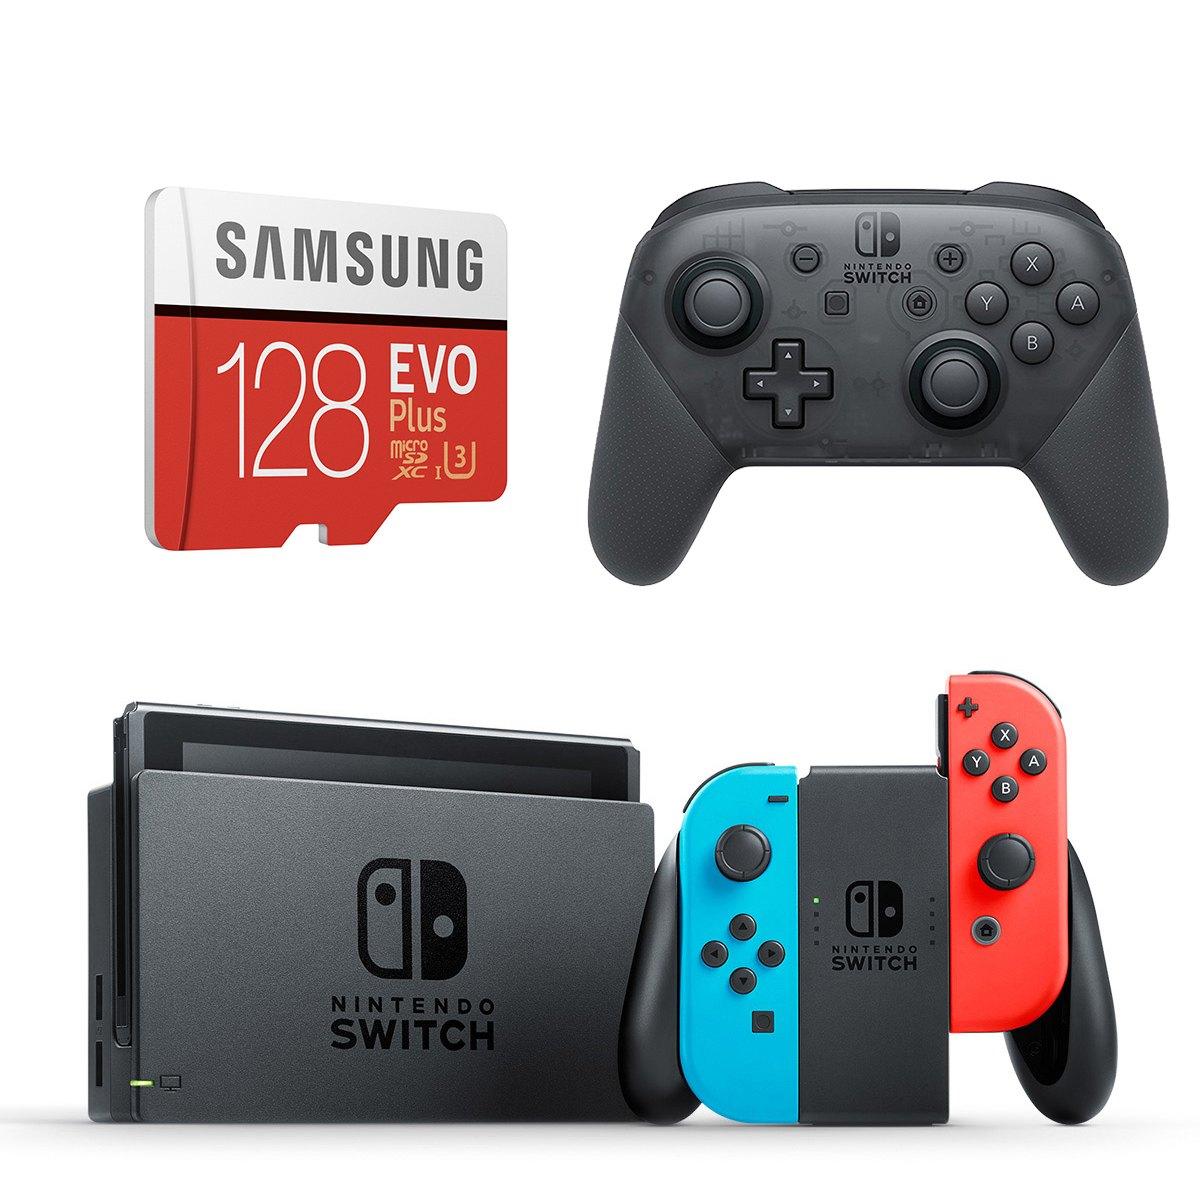 Nintendo Switch Neon Console + Pro Controller + Samsung 128GB MicroSD Card Starter Bundle: $340 AC + Free Shipping